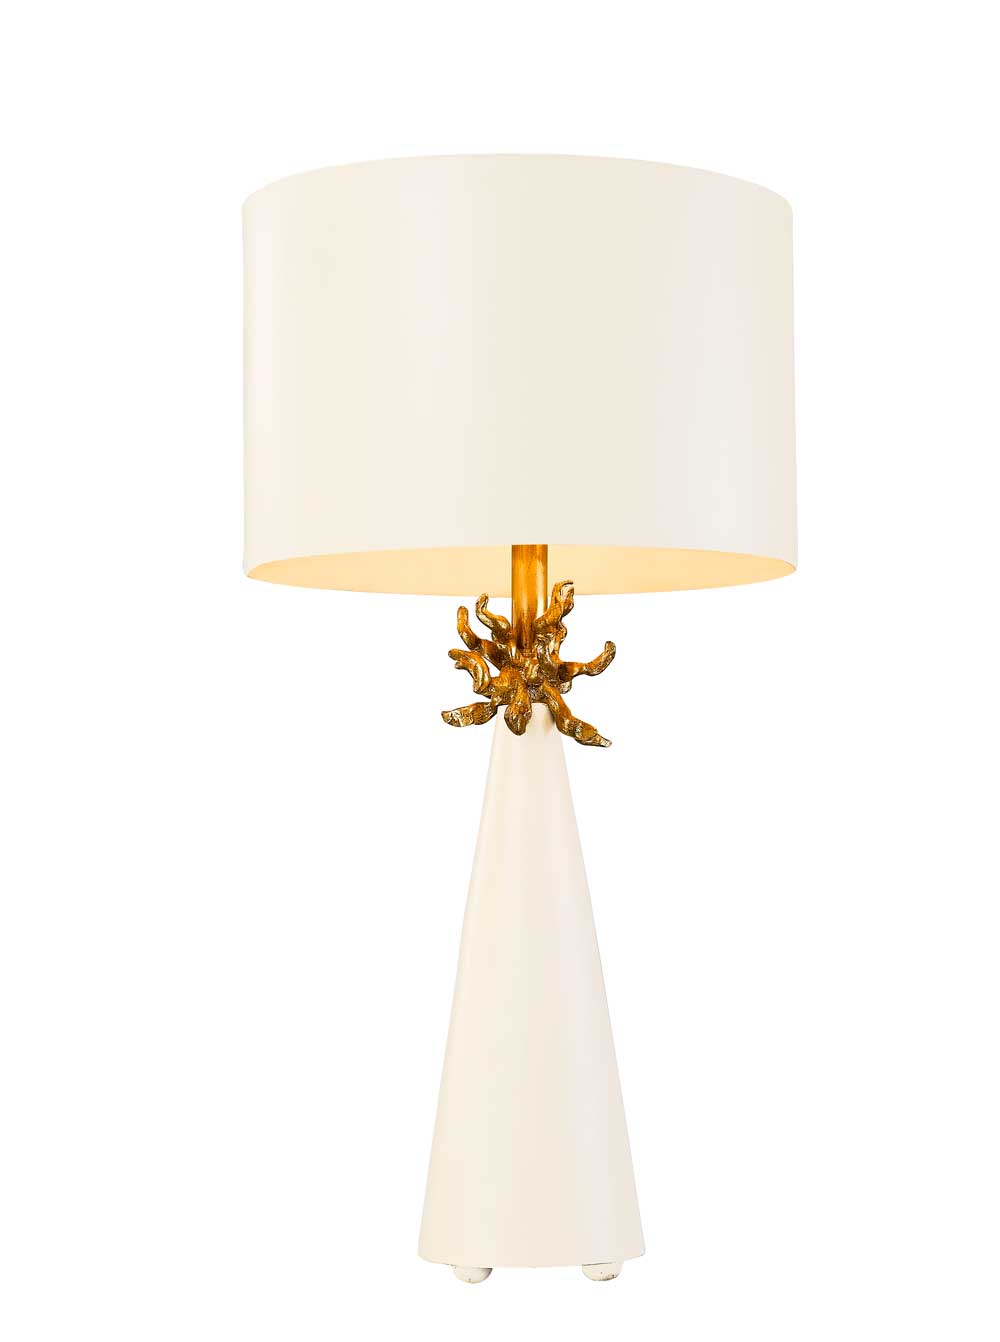 Lucas + McKearn Flambeau Neo White  Table Lamp